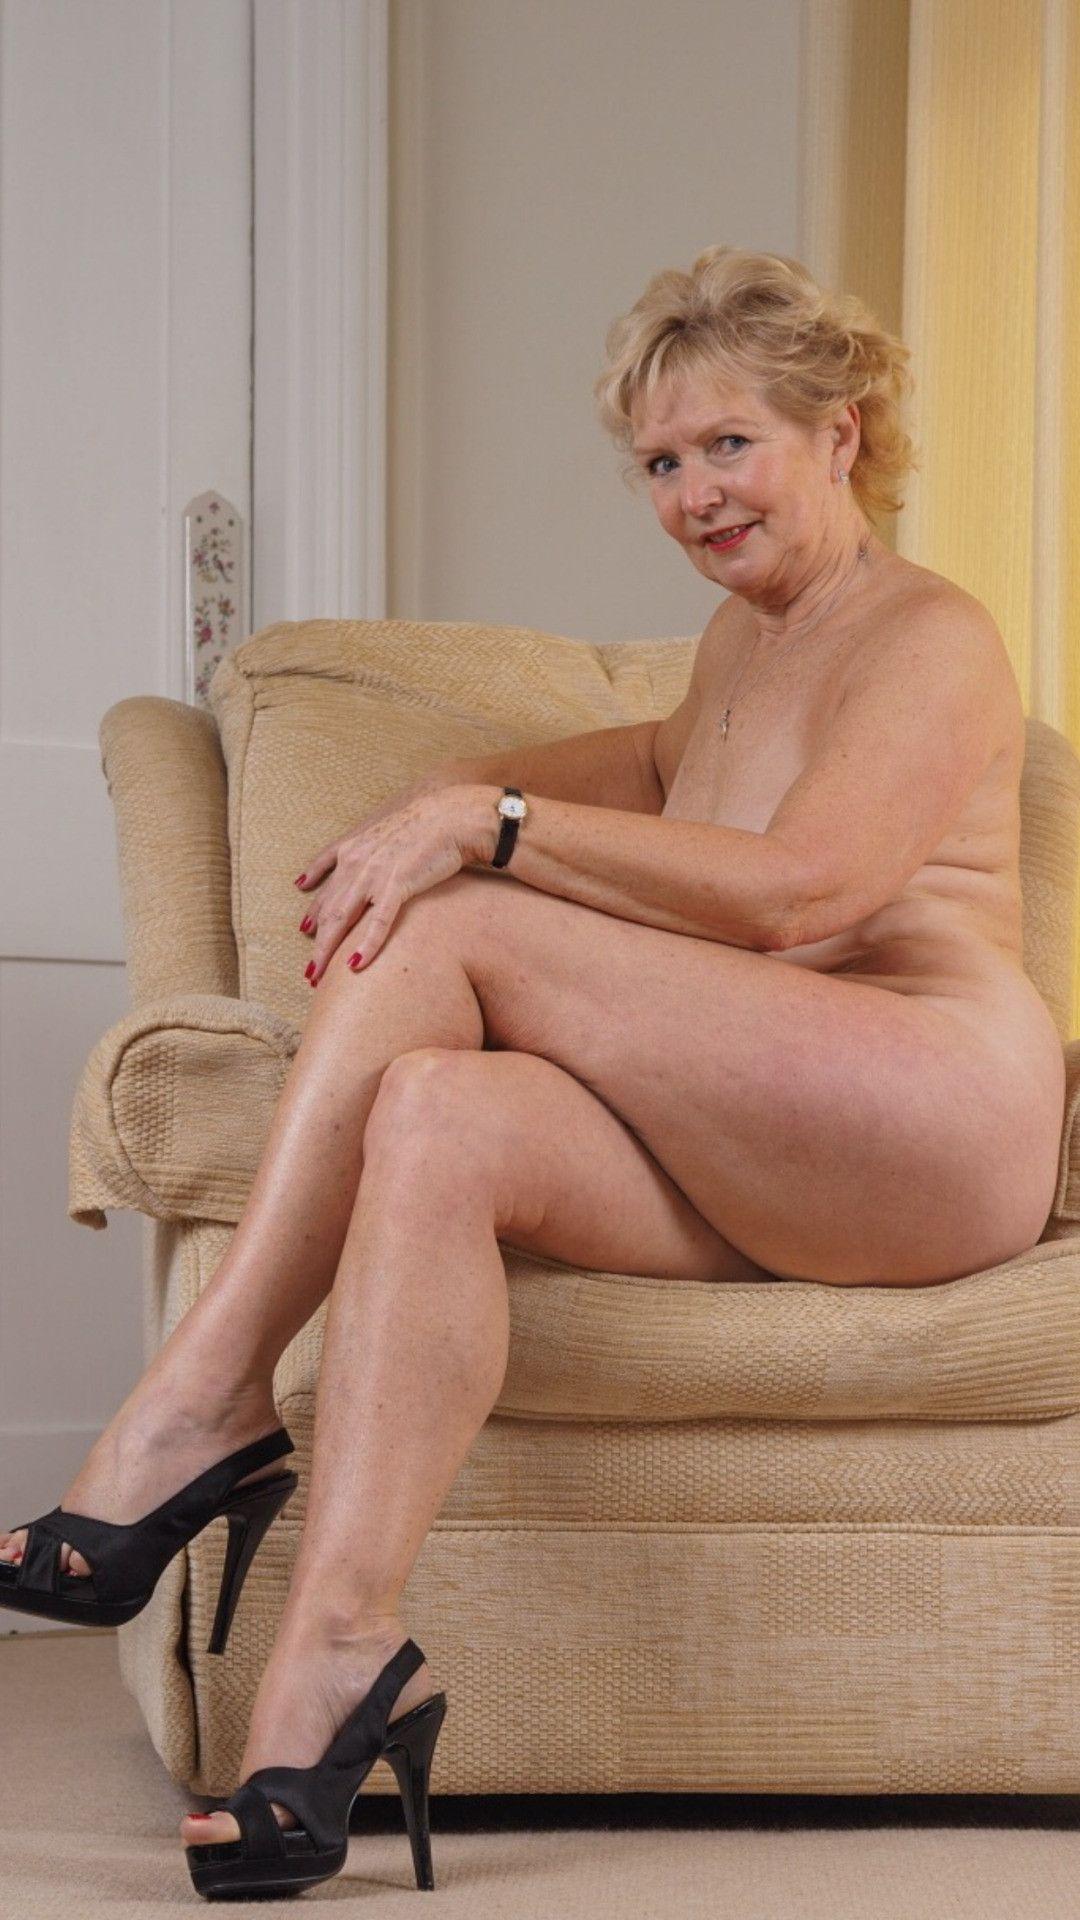 Grannys nude We're Having